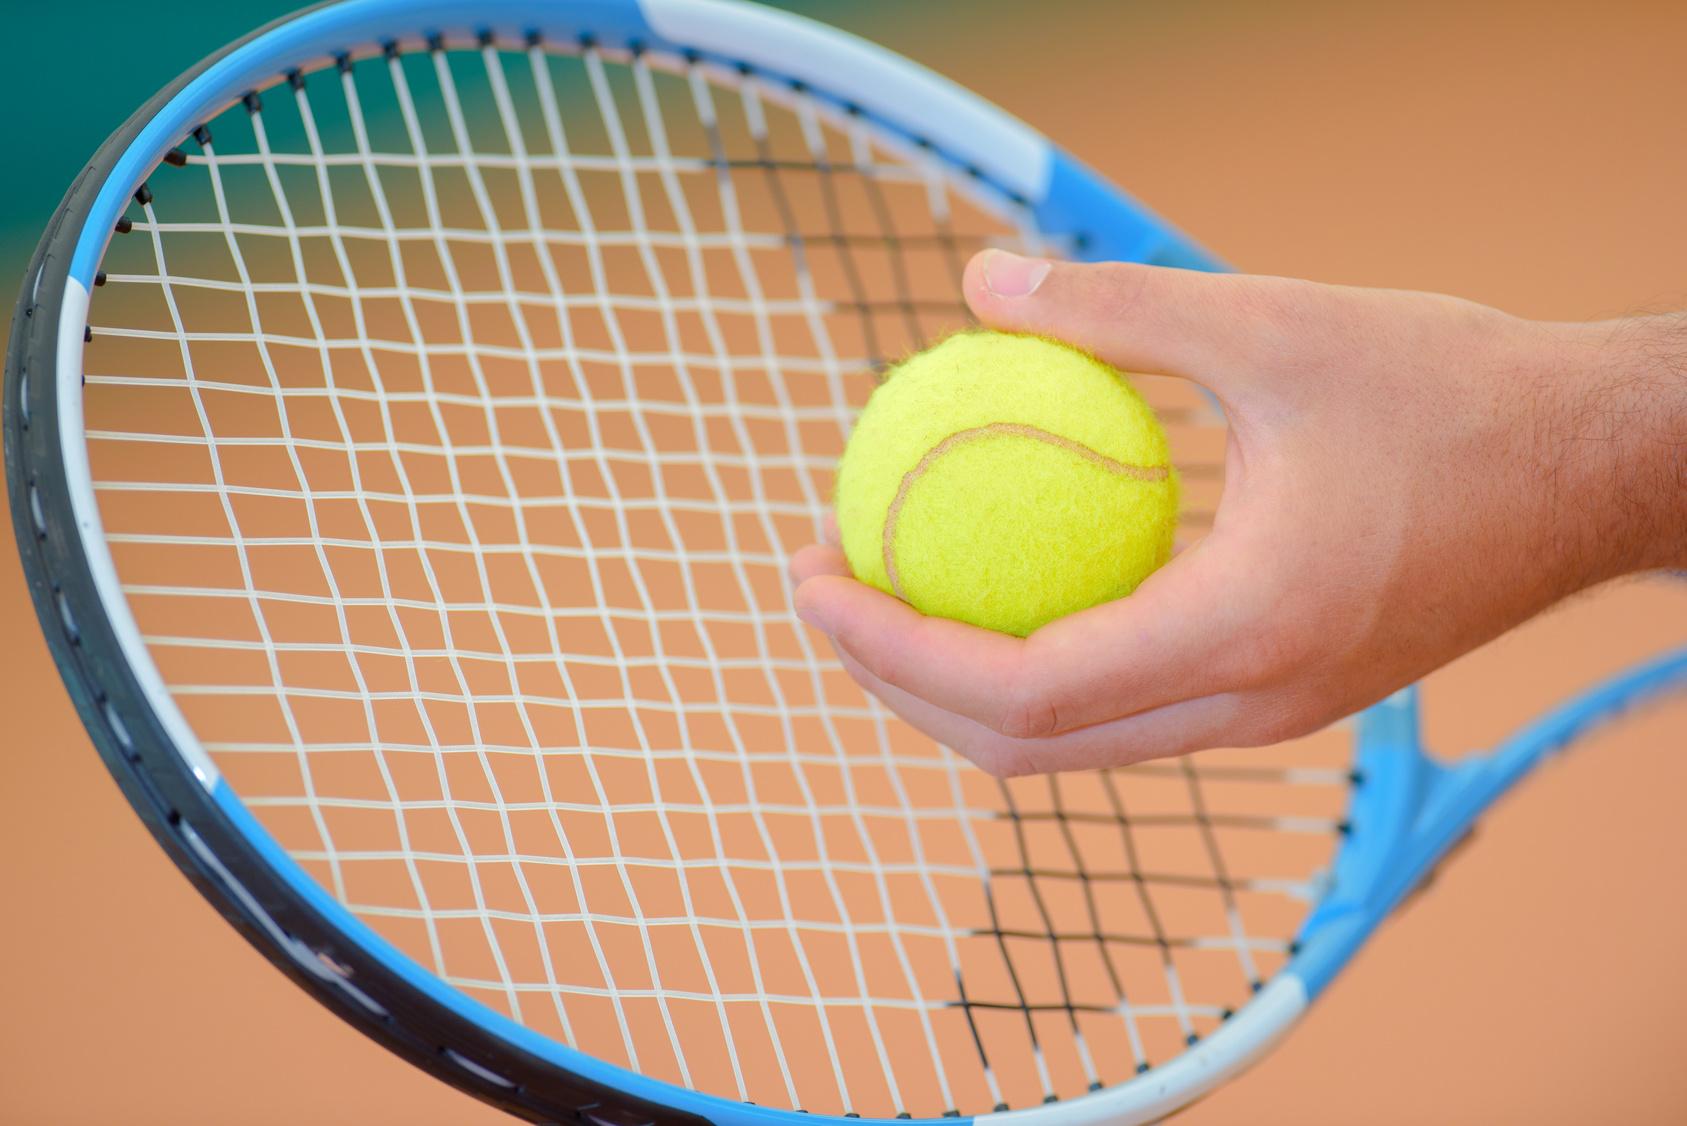 Tamiz Raqueta tenis